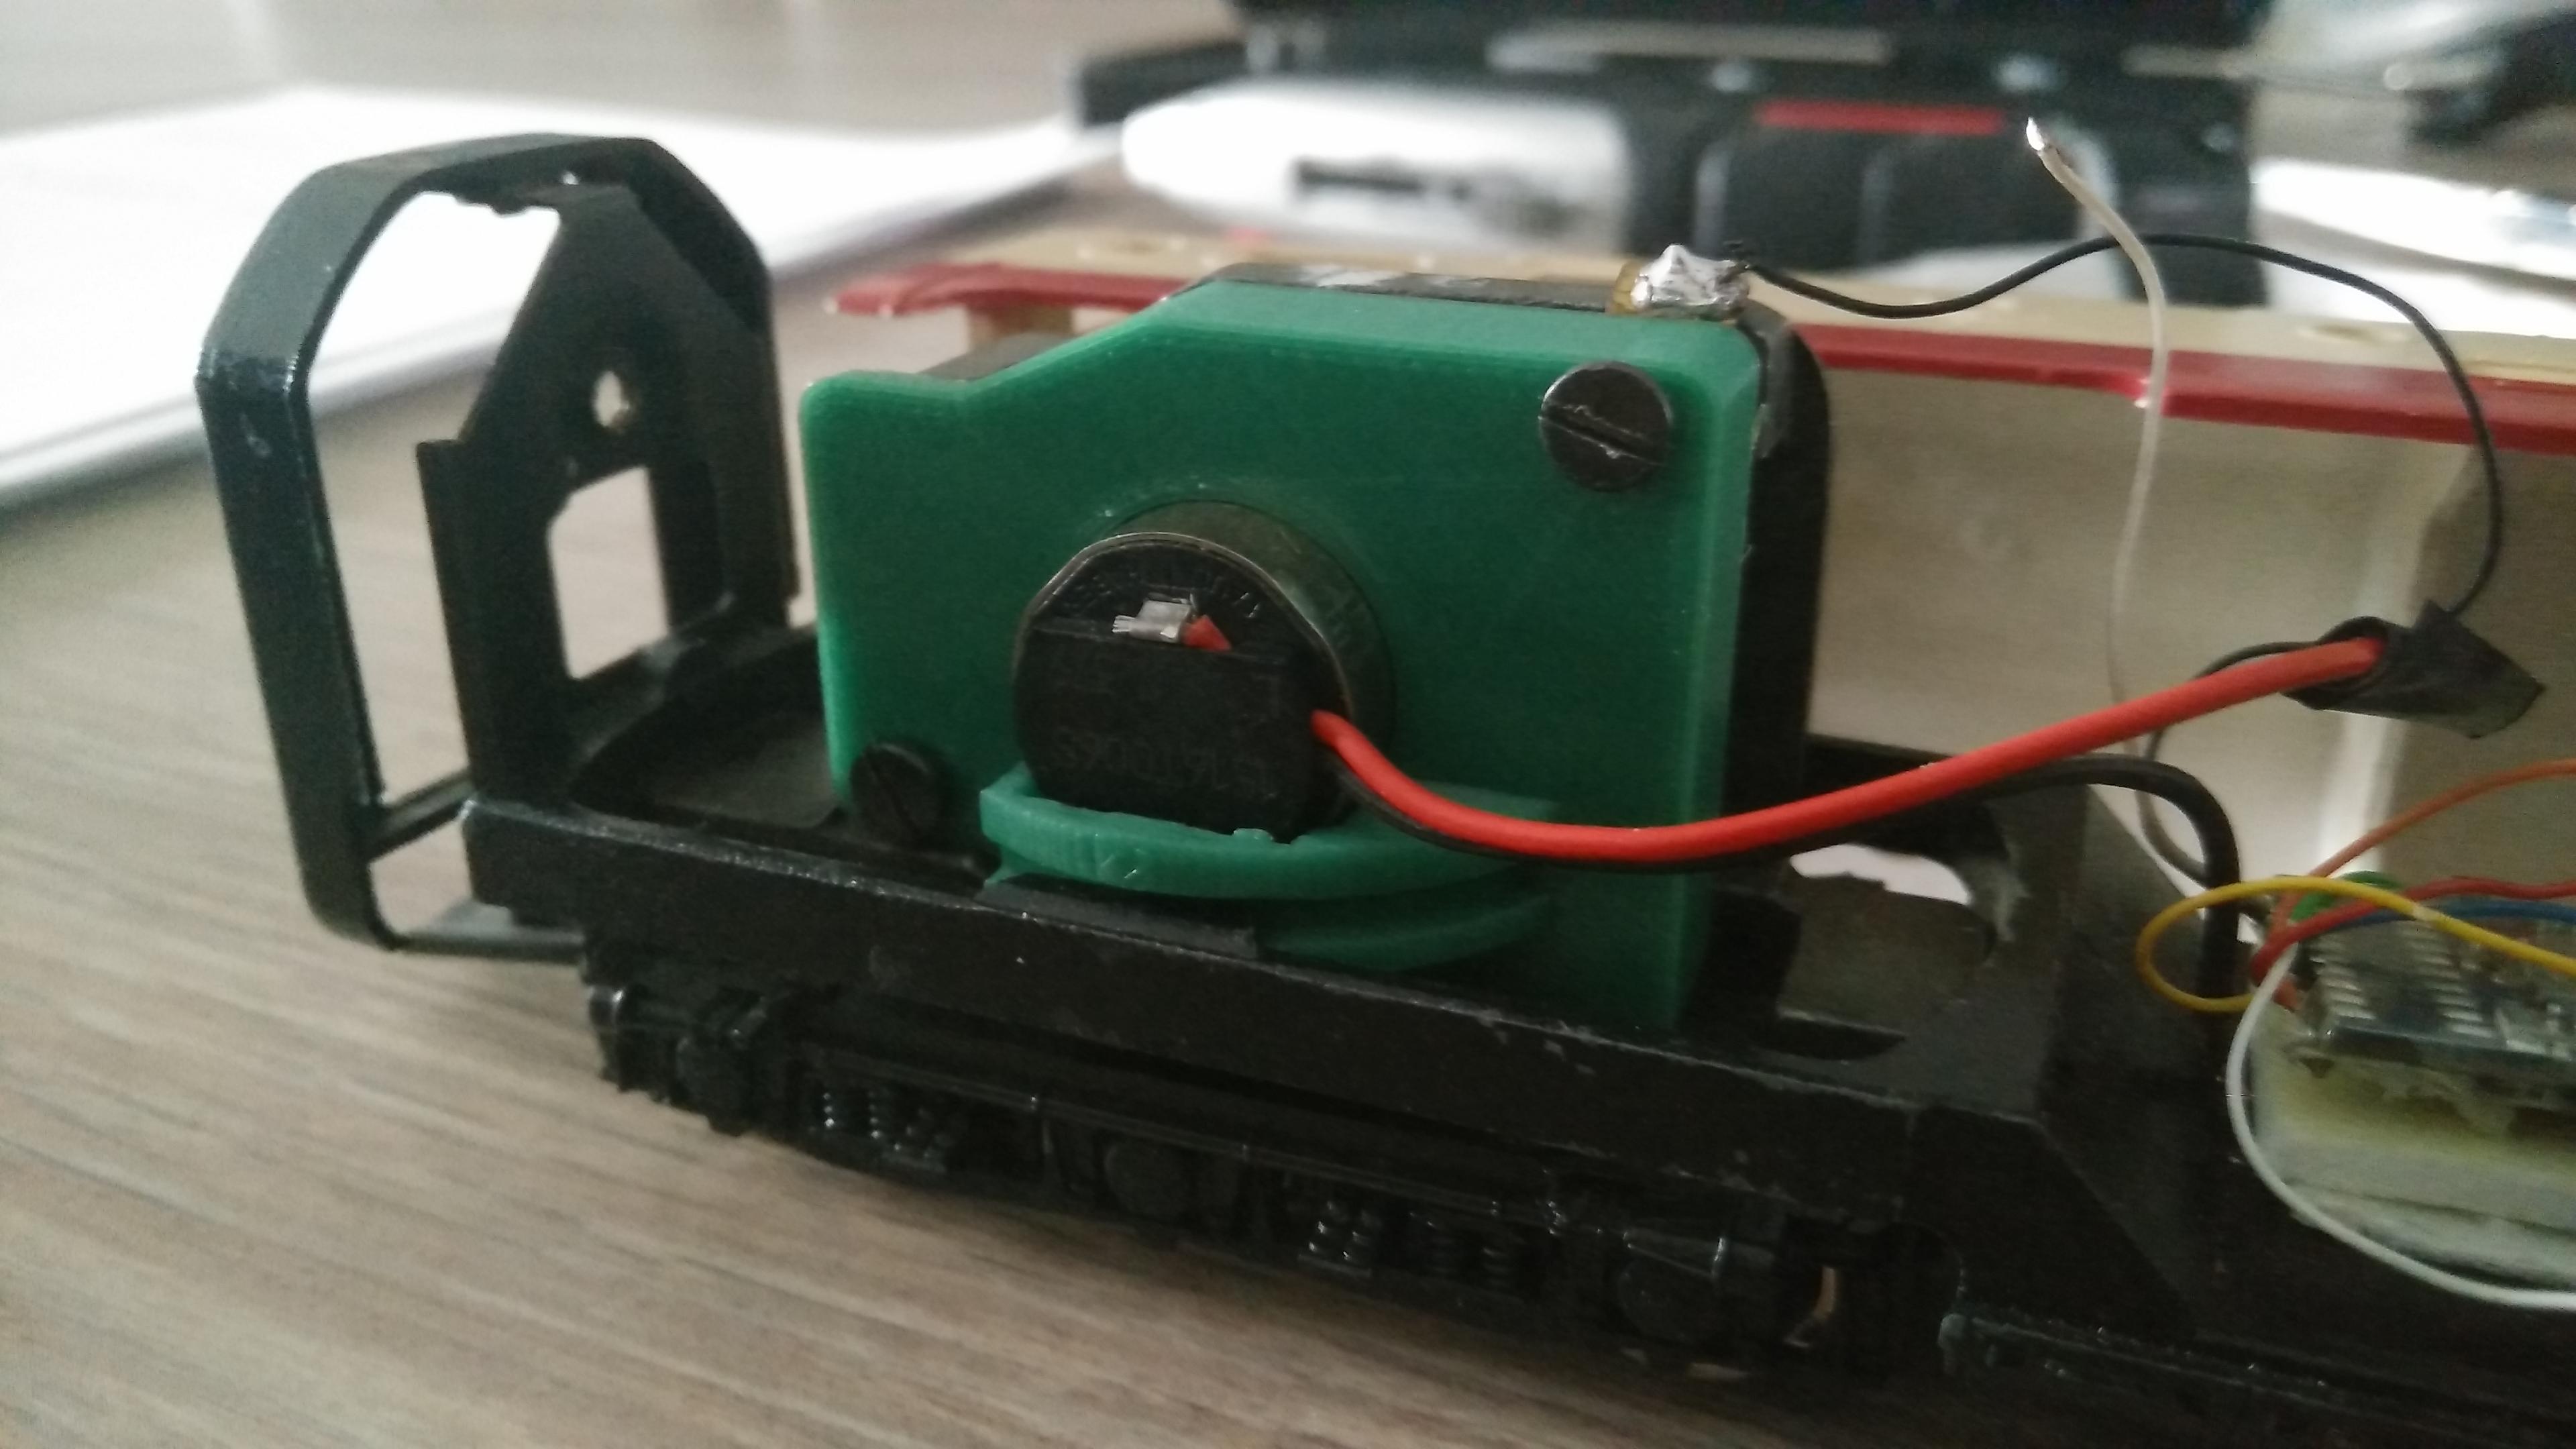 Marklin LCFM TEE RAM Maxon motor replacement by